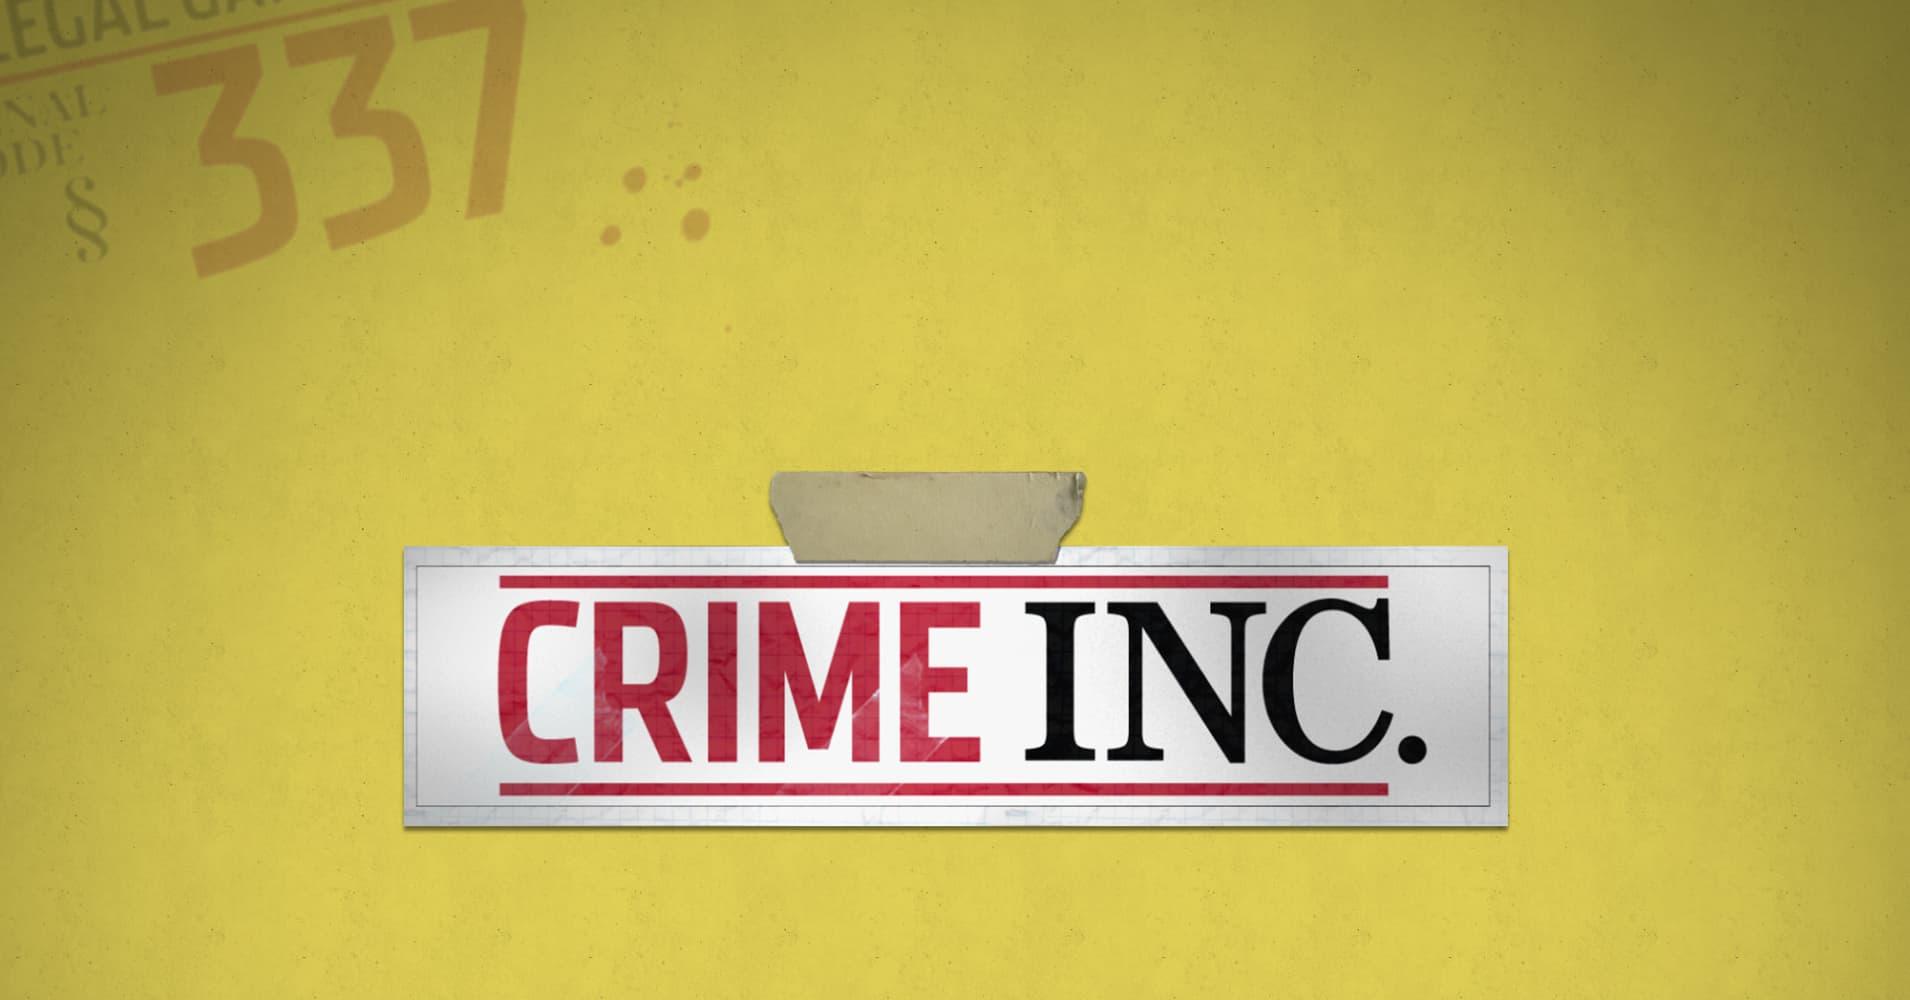 Cnbc the big business of illegal gambling free vegas slot machine games 457